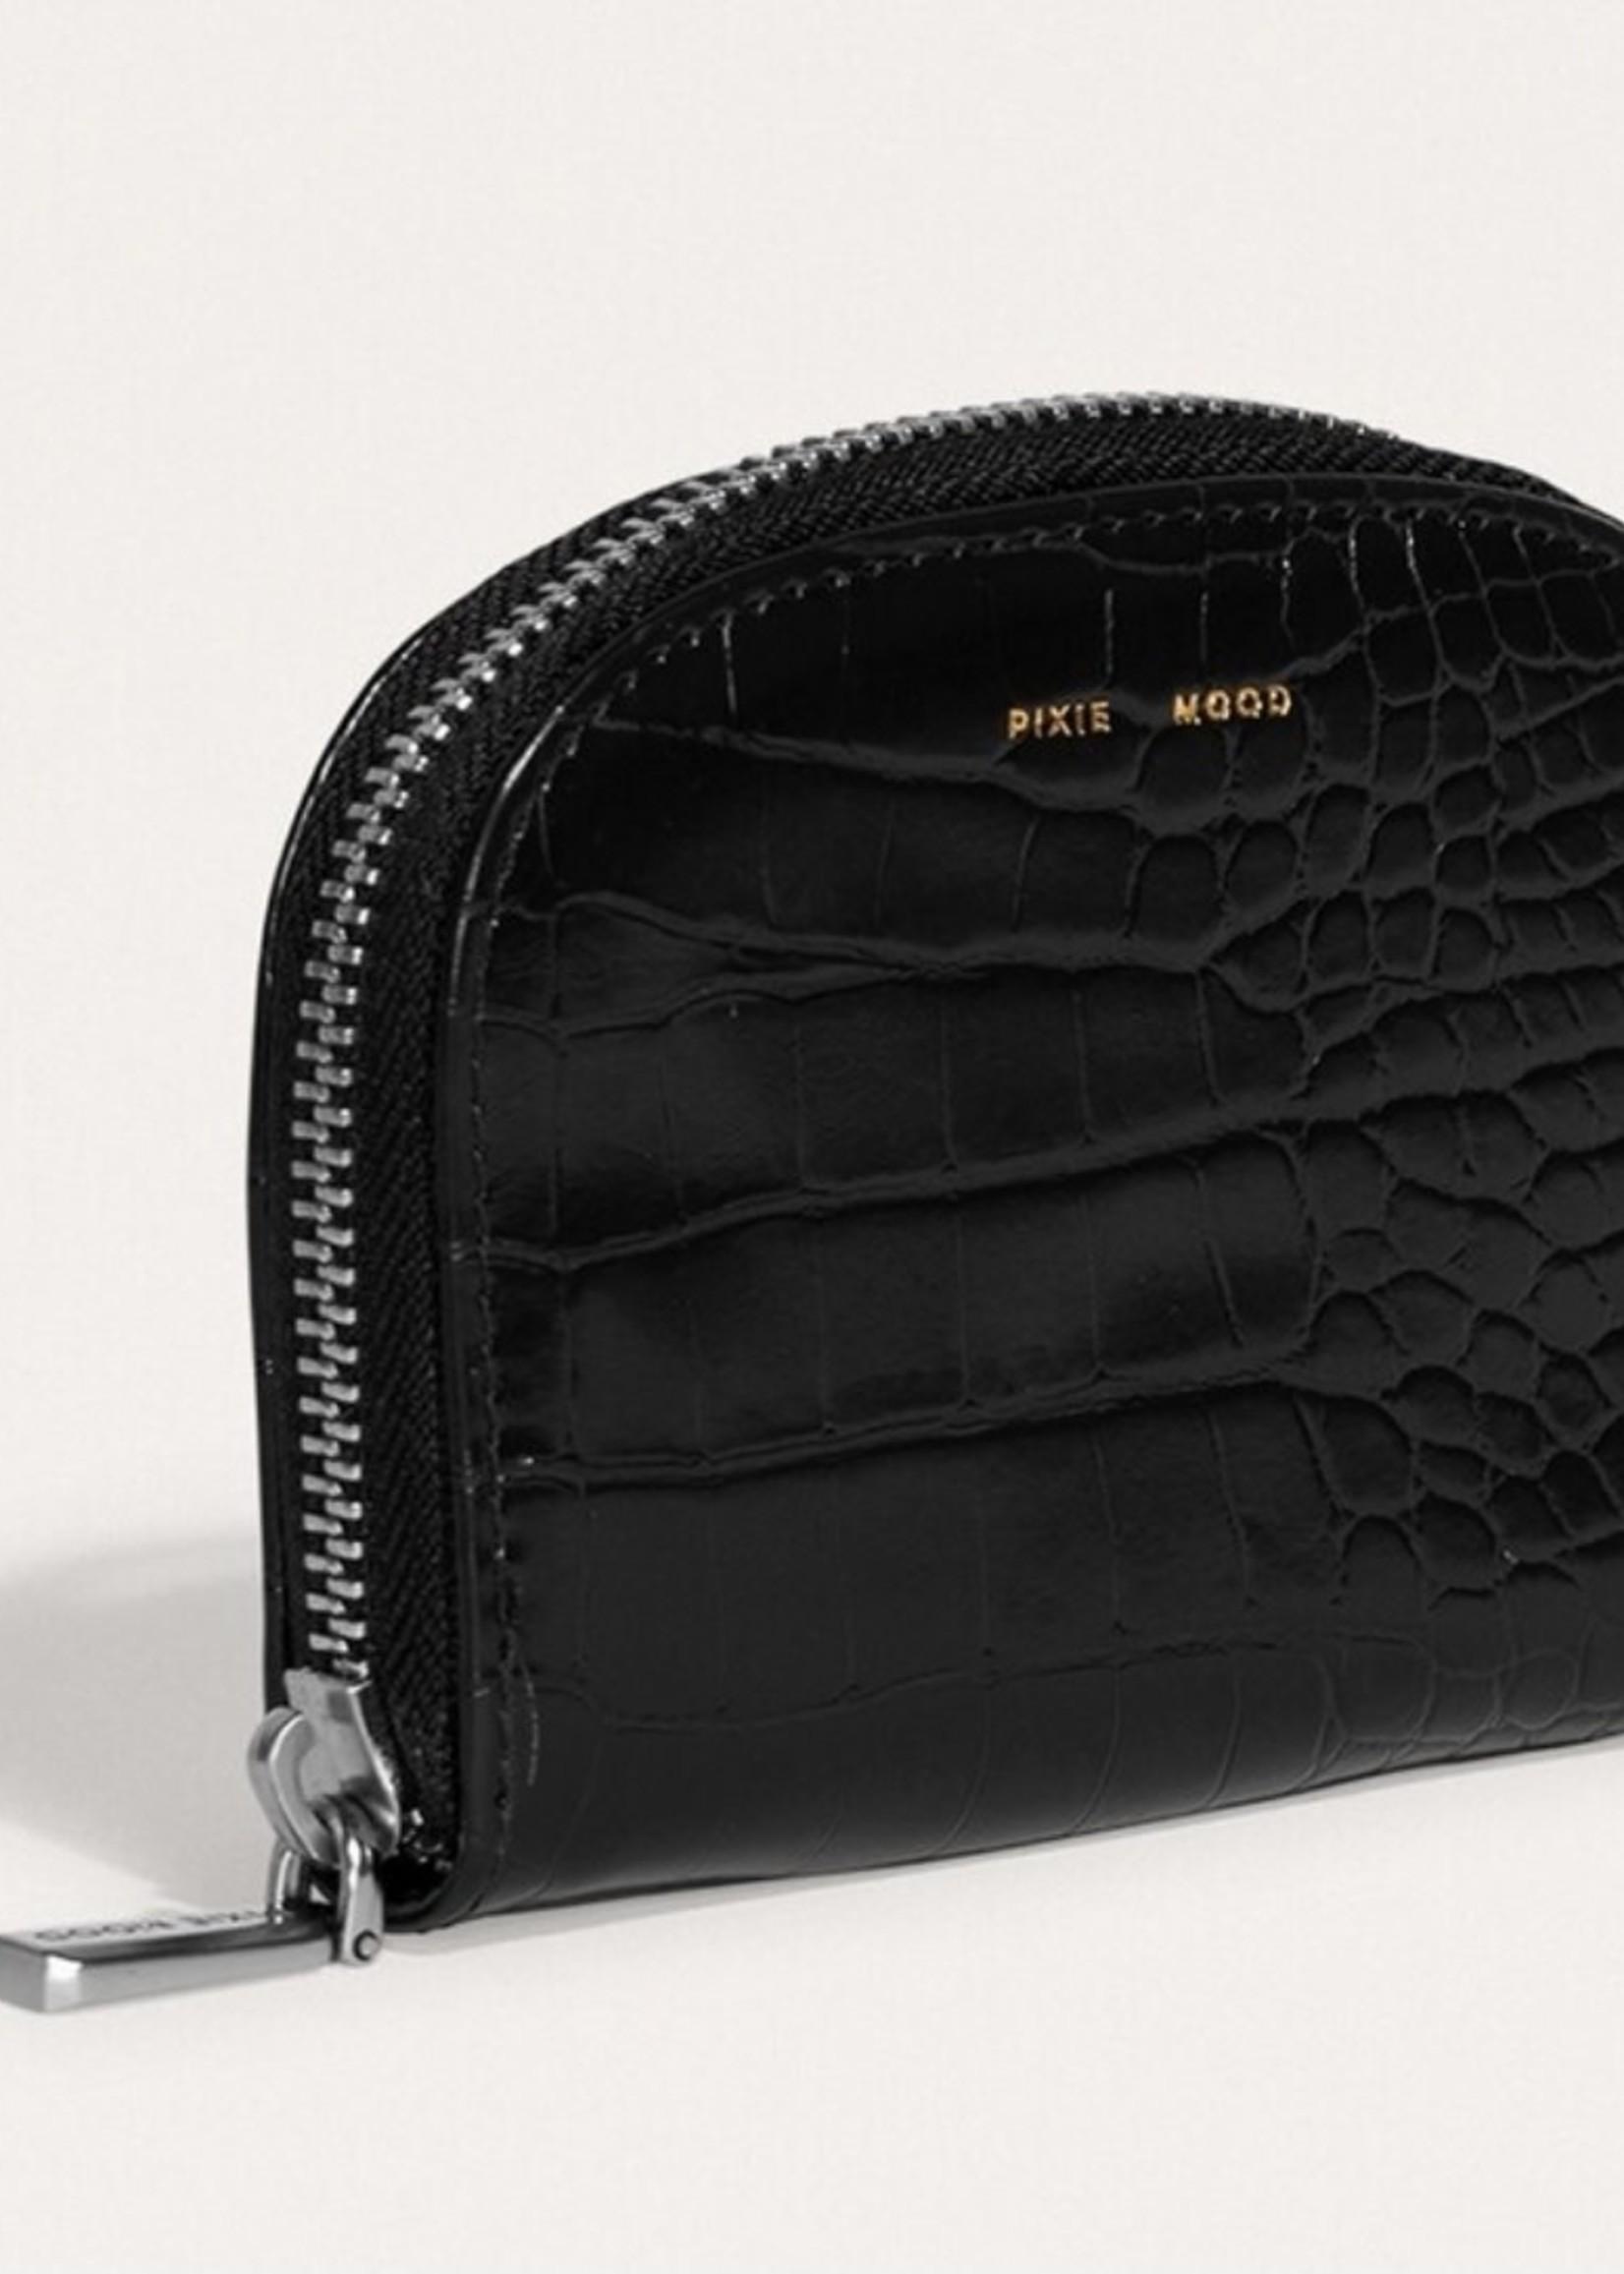 PIXIE MOOD Ida Card Case BLACK CROC